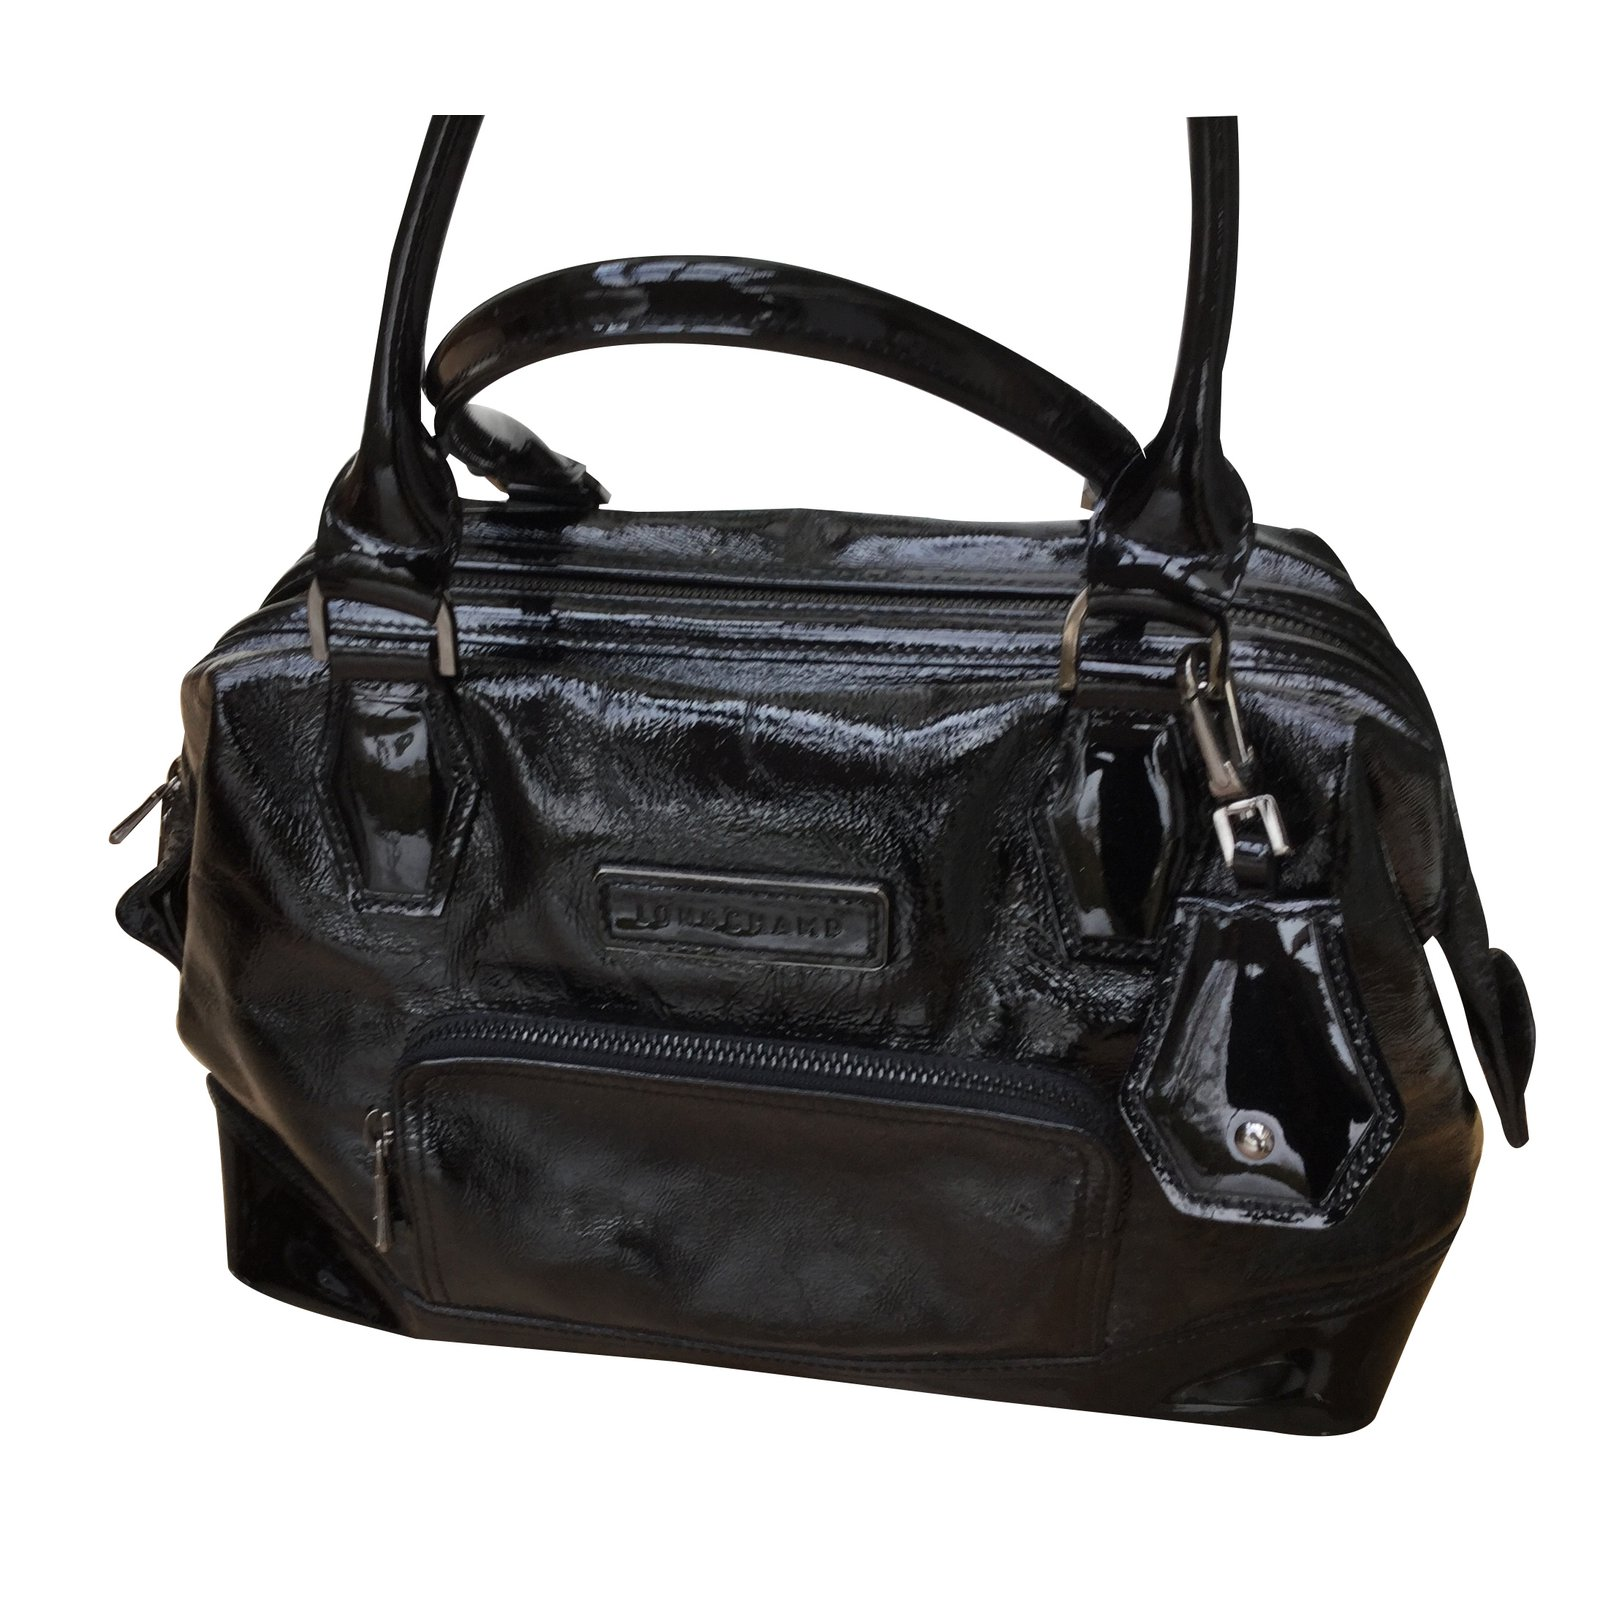 54bfe2434f24 Longchamp Handbags Handbags Patent leather Black ref.14722 - Joli Closet